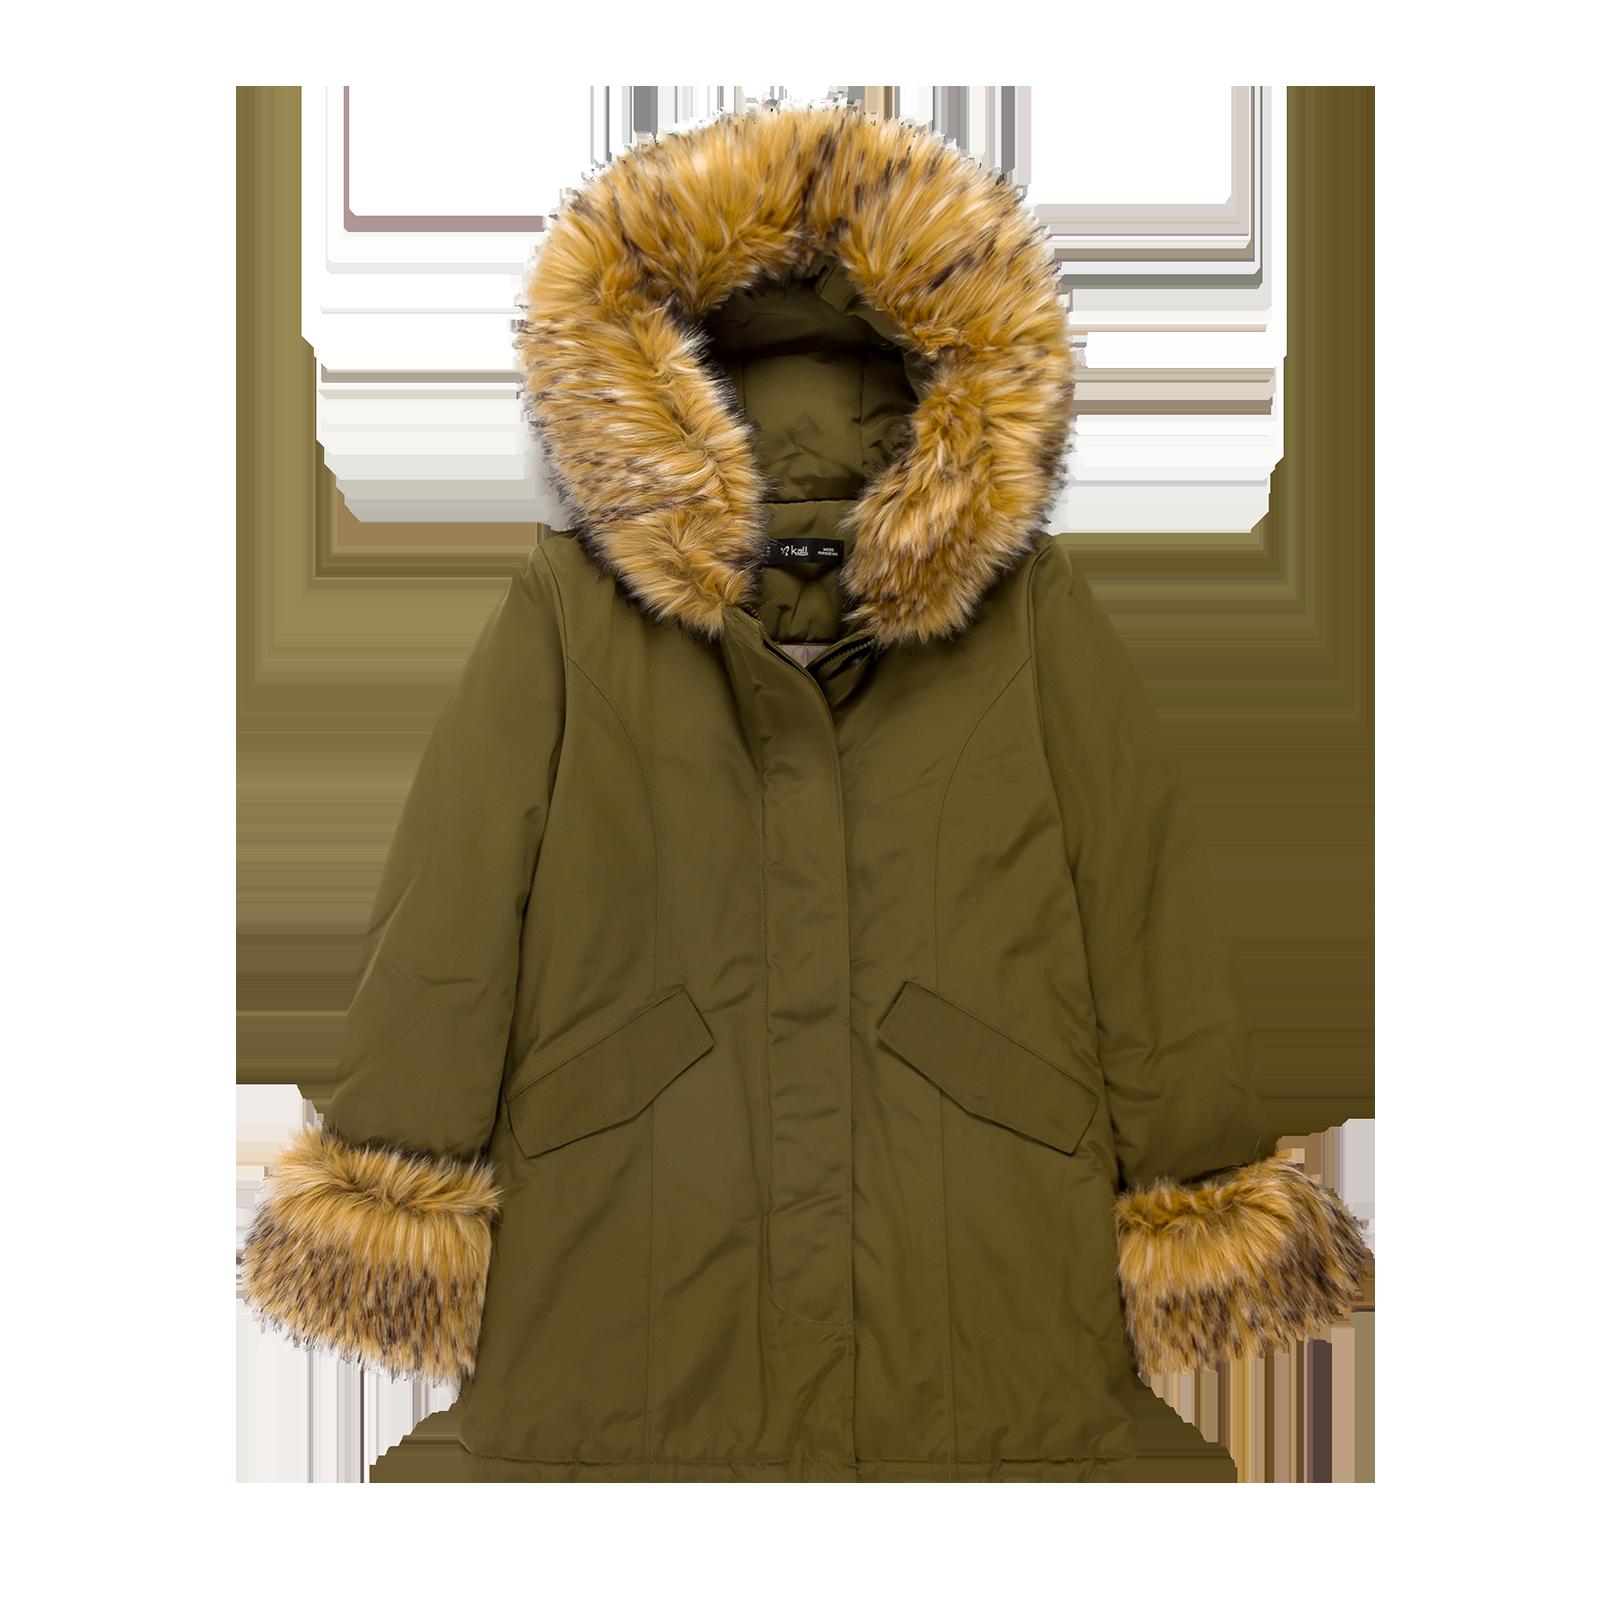 Winter coat product image